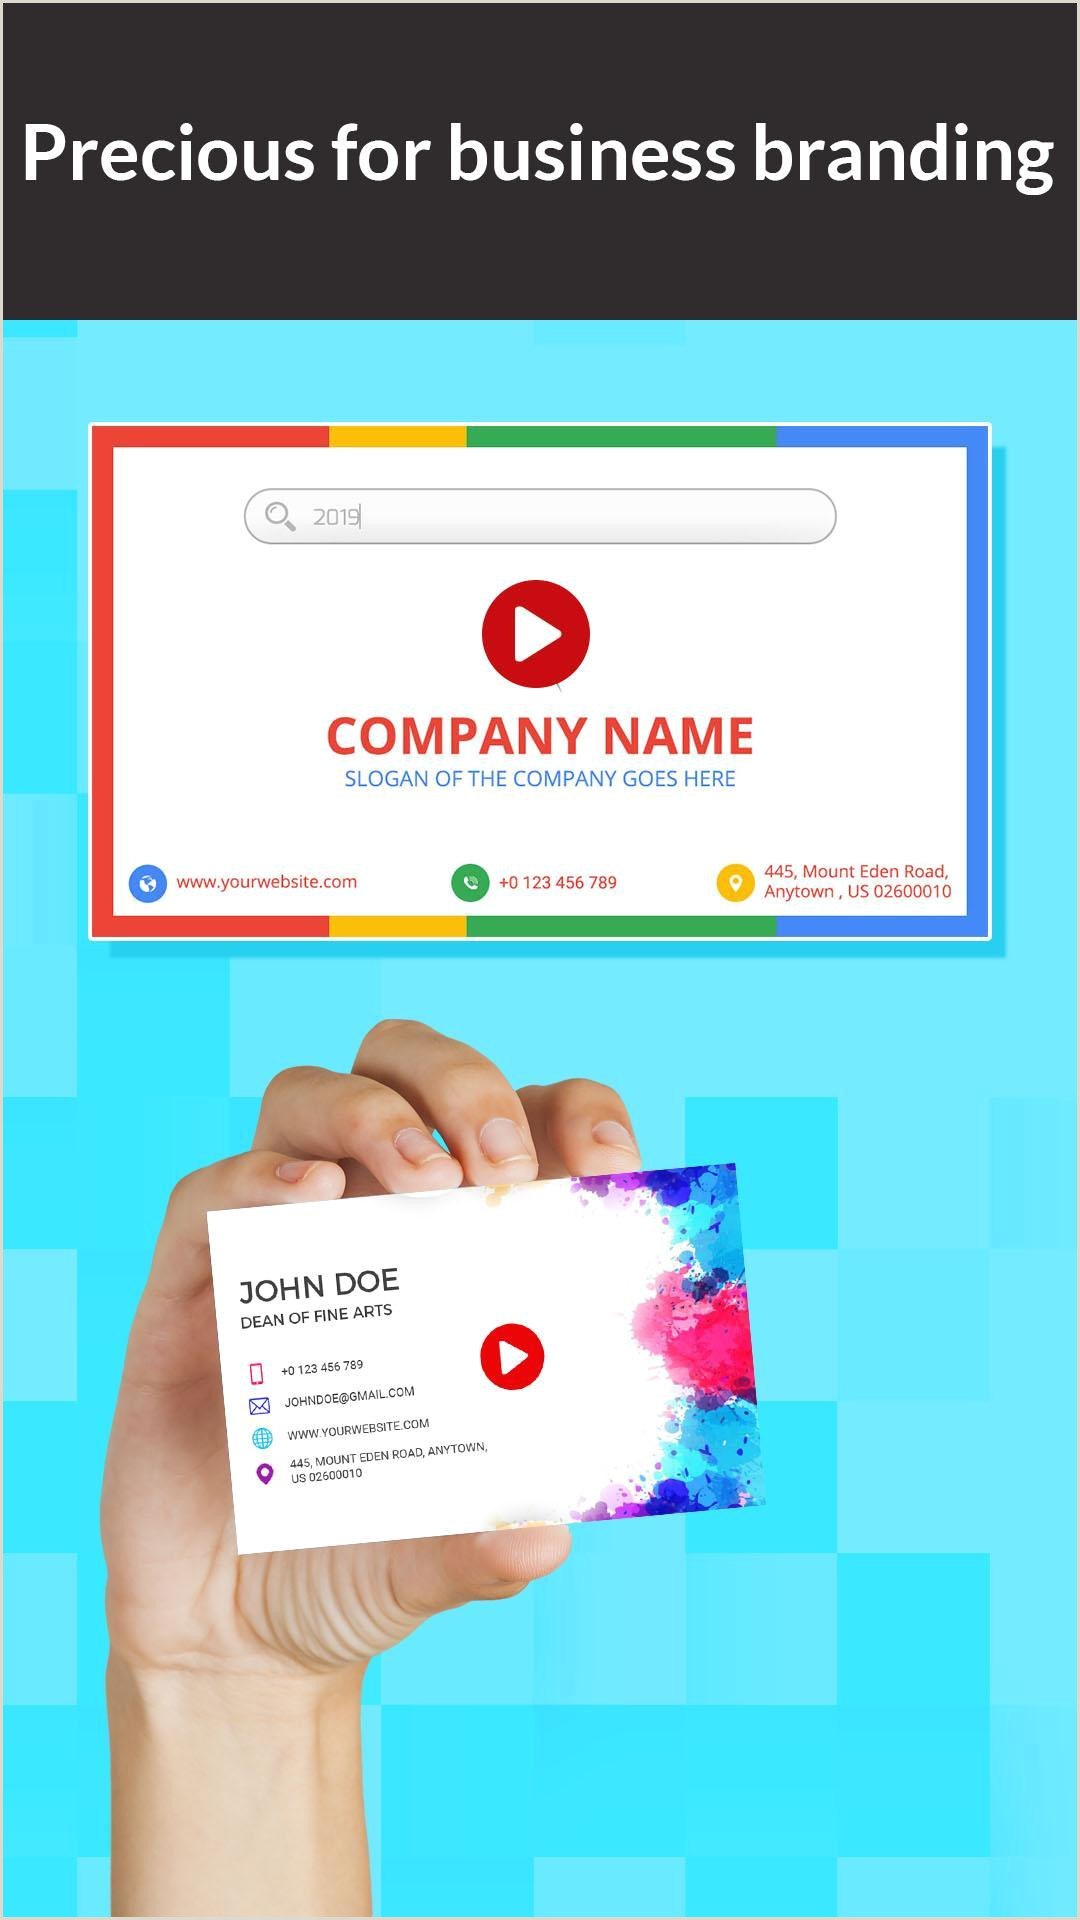 Best Business Cards For Videogrpaher.editor Digital Video Business Card Maker For Android Apk Download